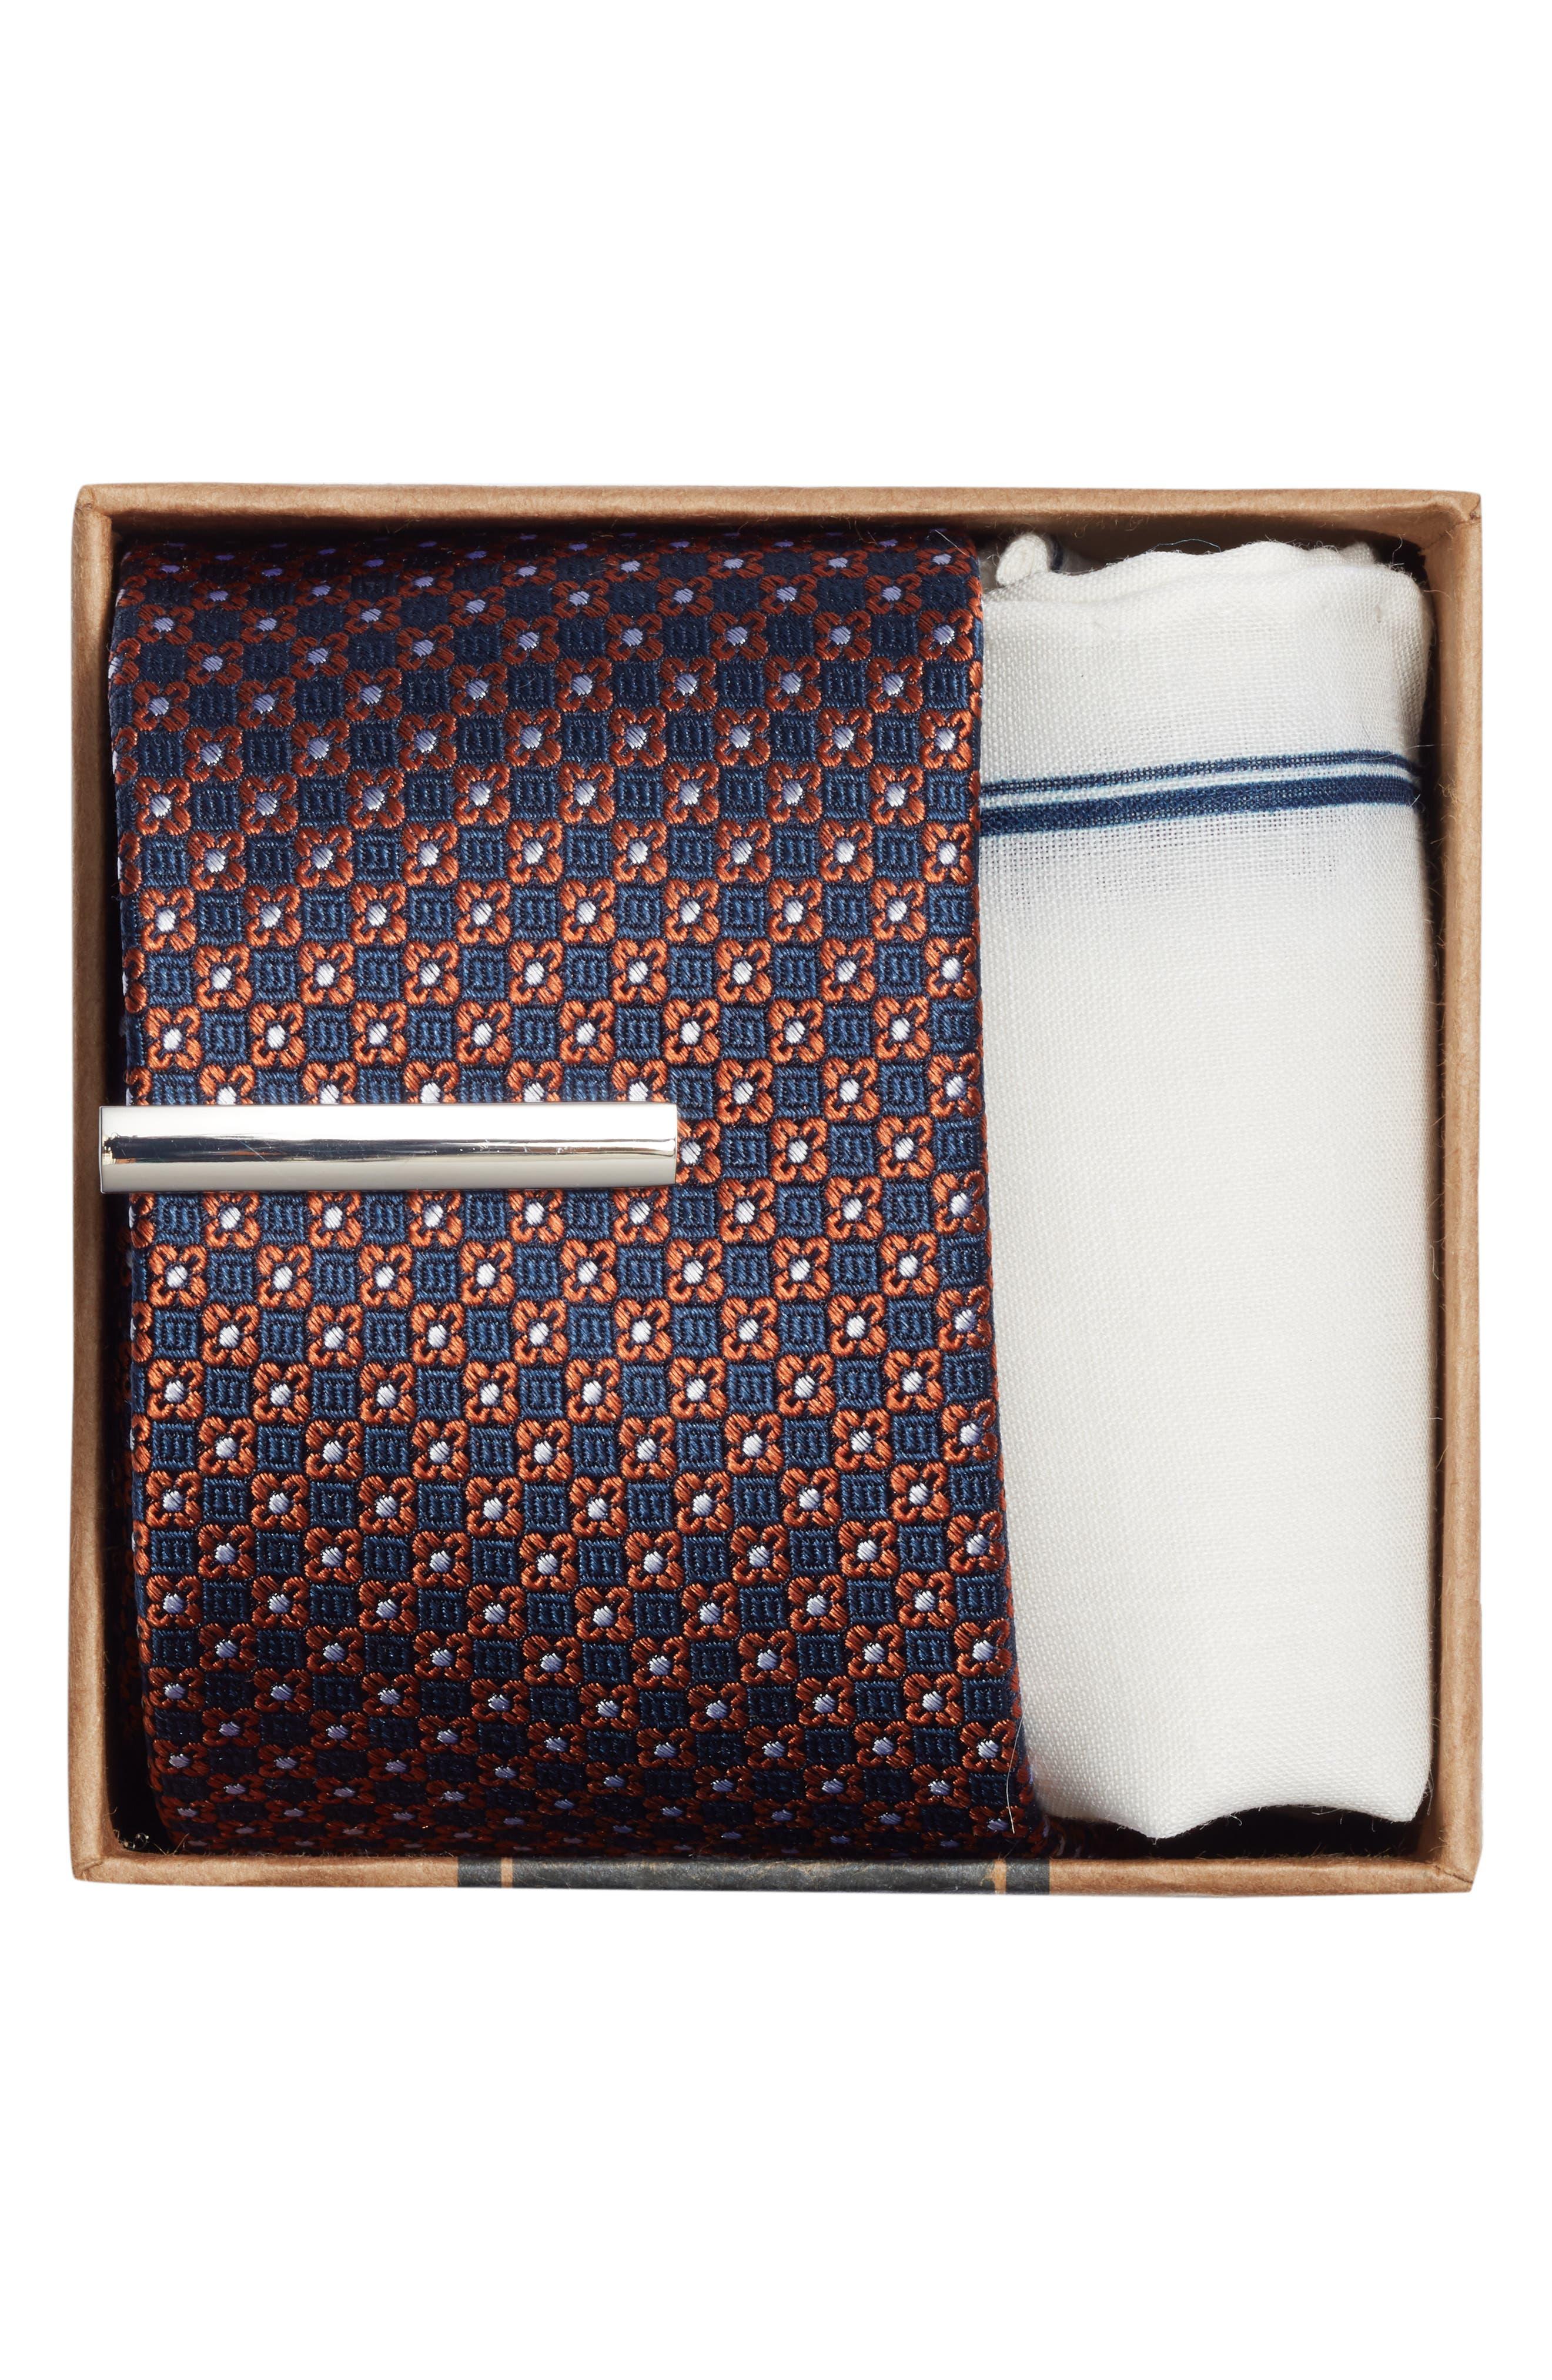 Flower Network 3-Piece Skinny Tie Style Box,                             Alternate thumbnail 2, color,                             Orange